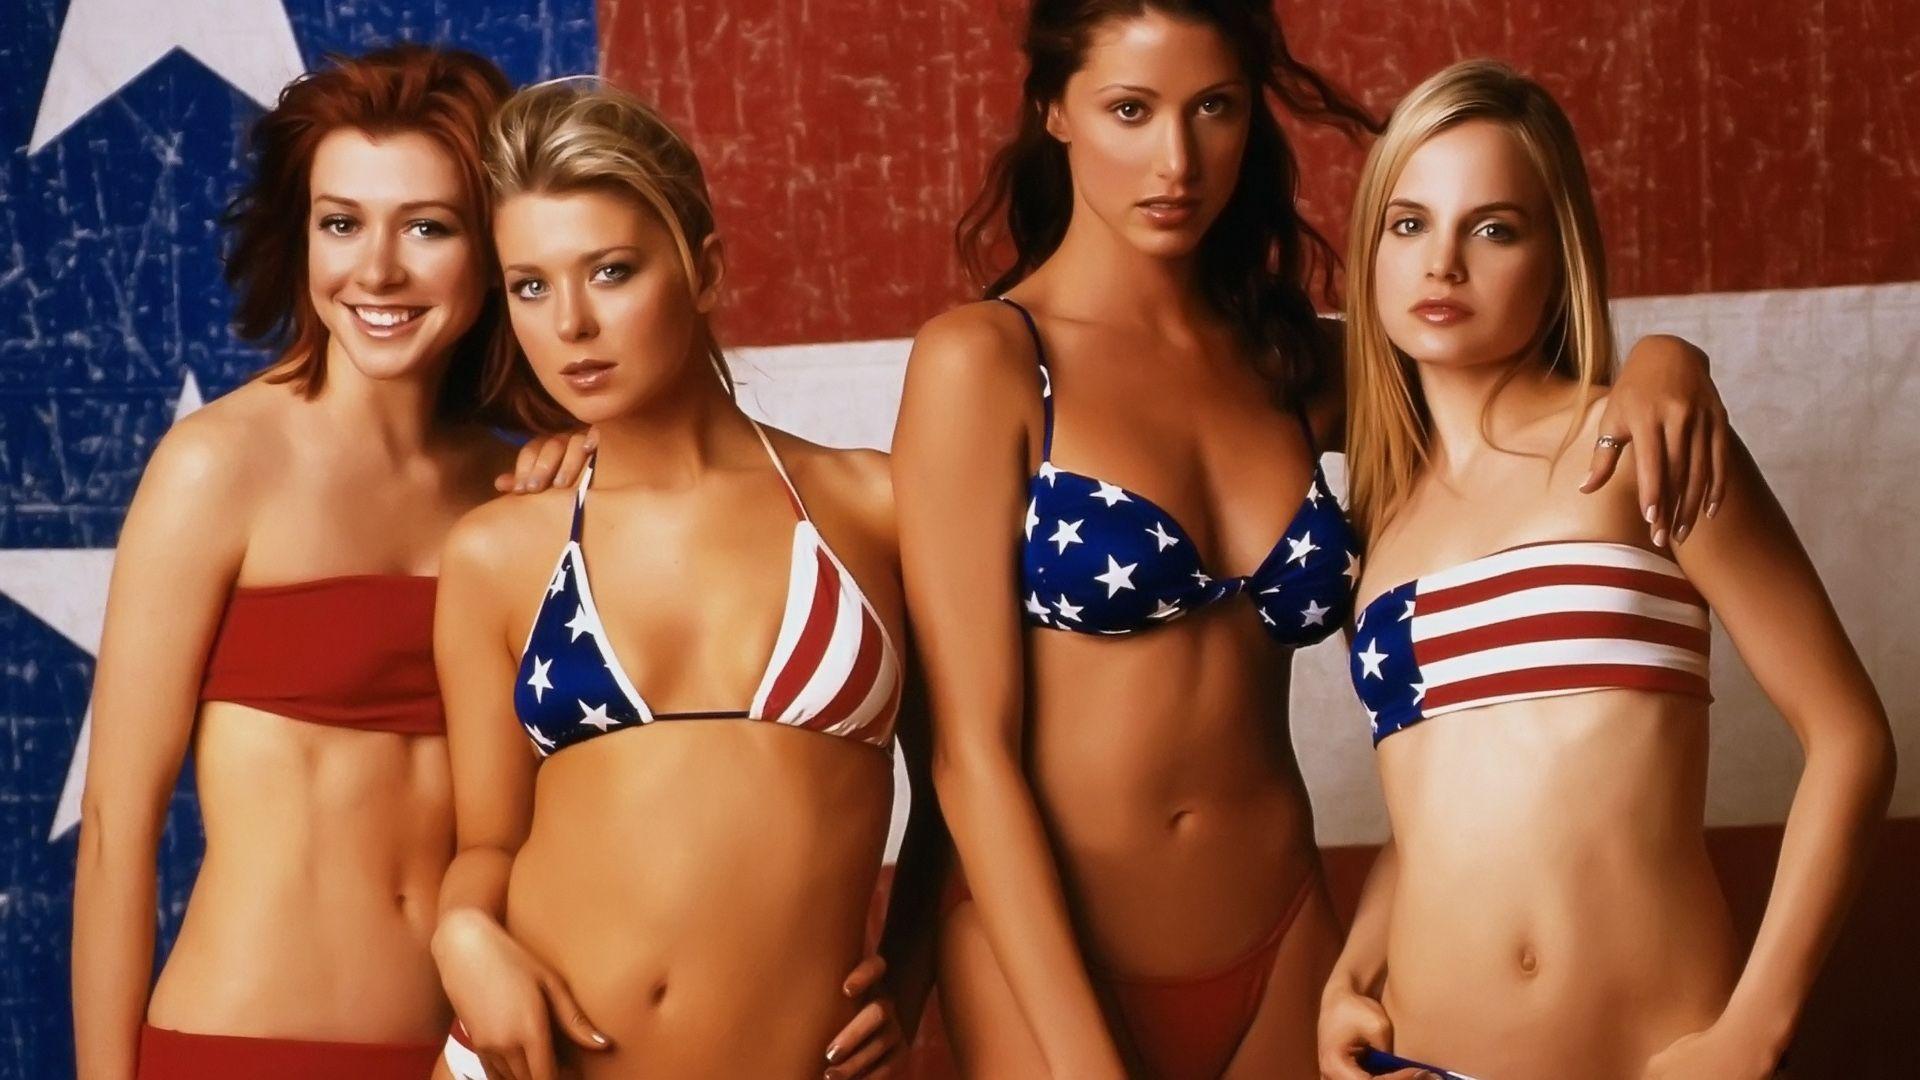 american-sexy-girls-american-film-name